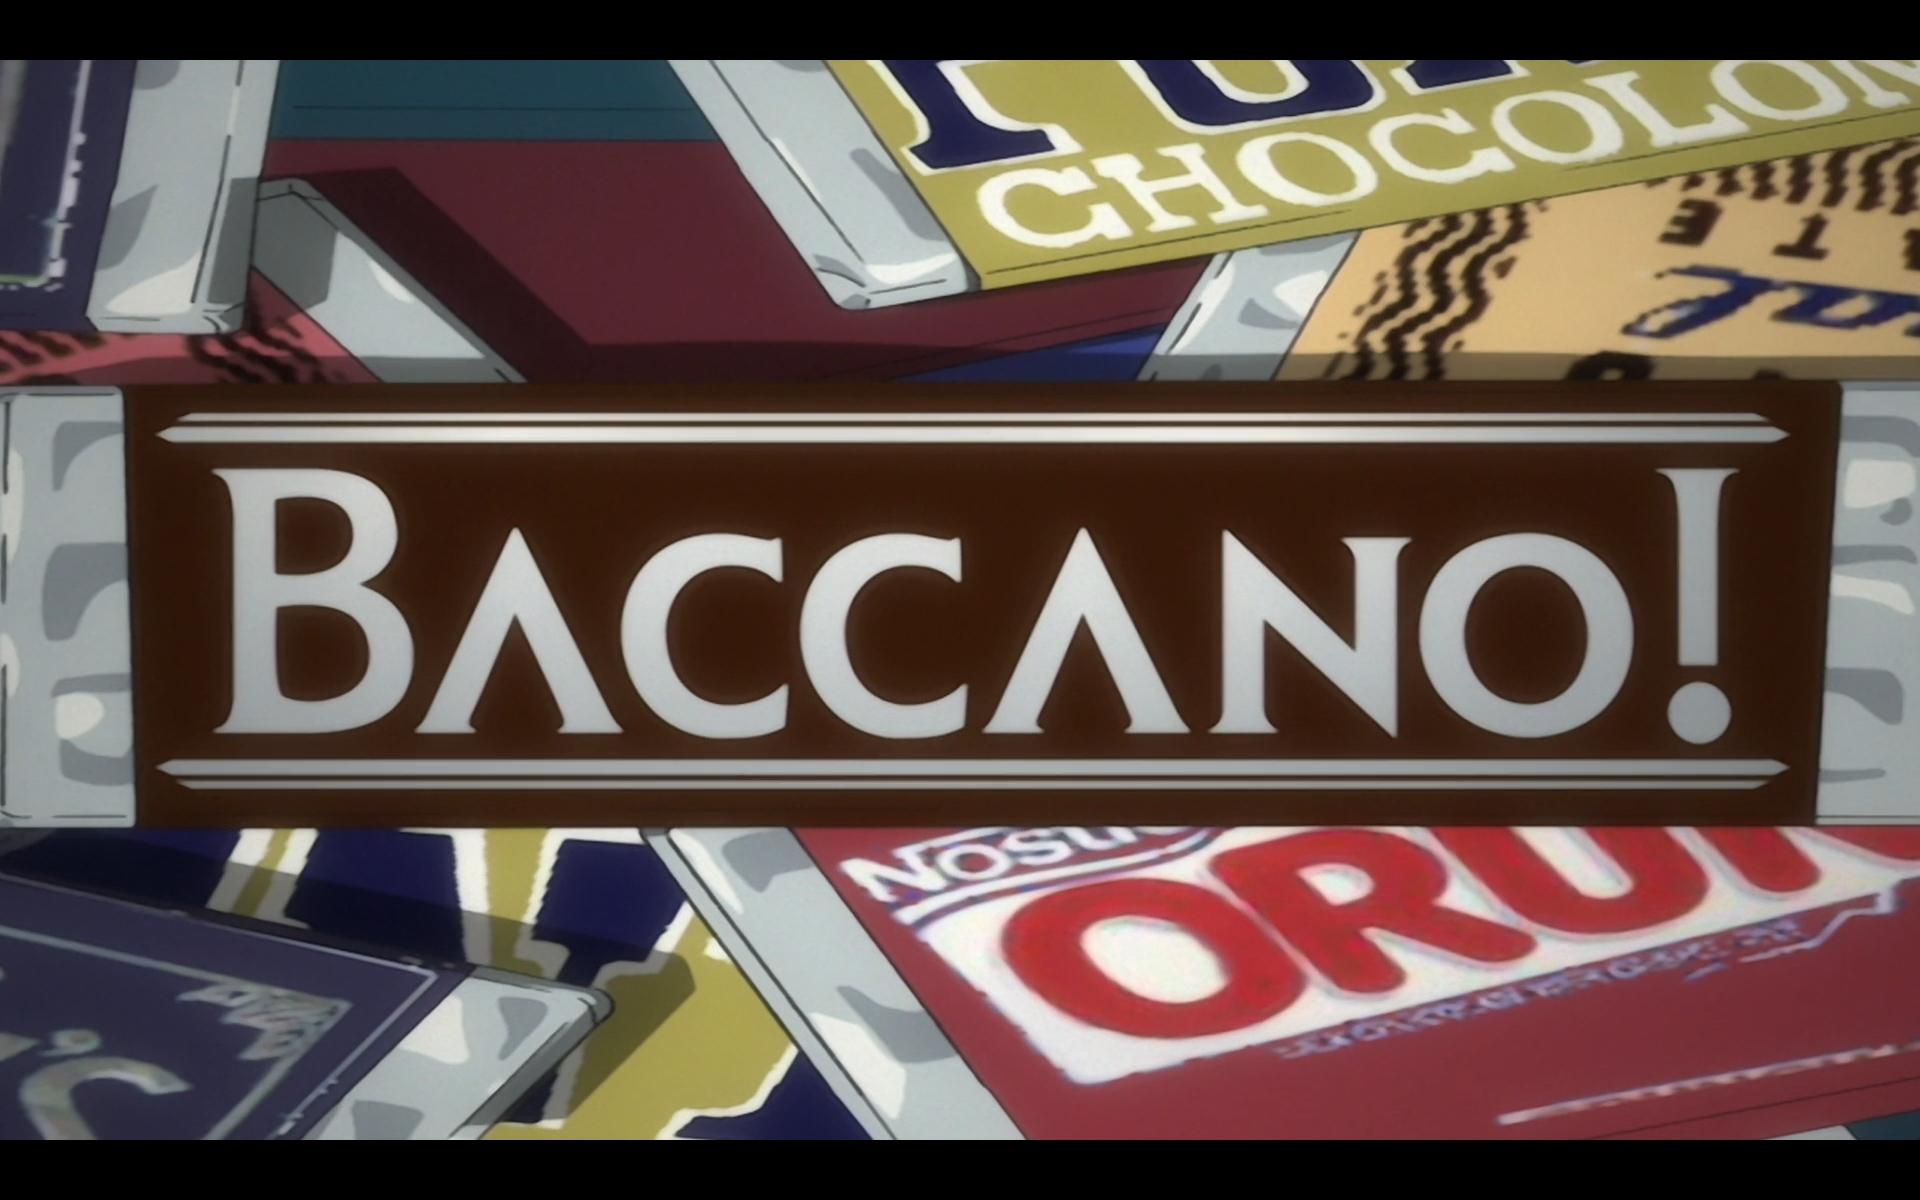 baccano free download